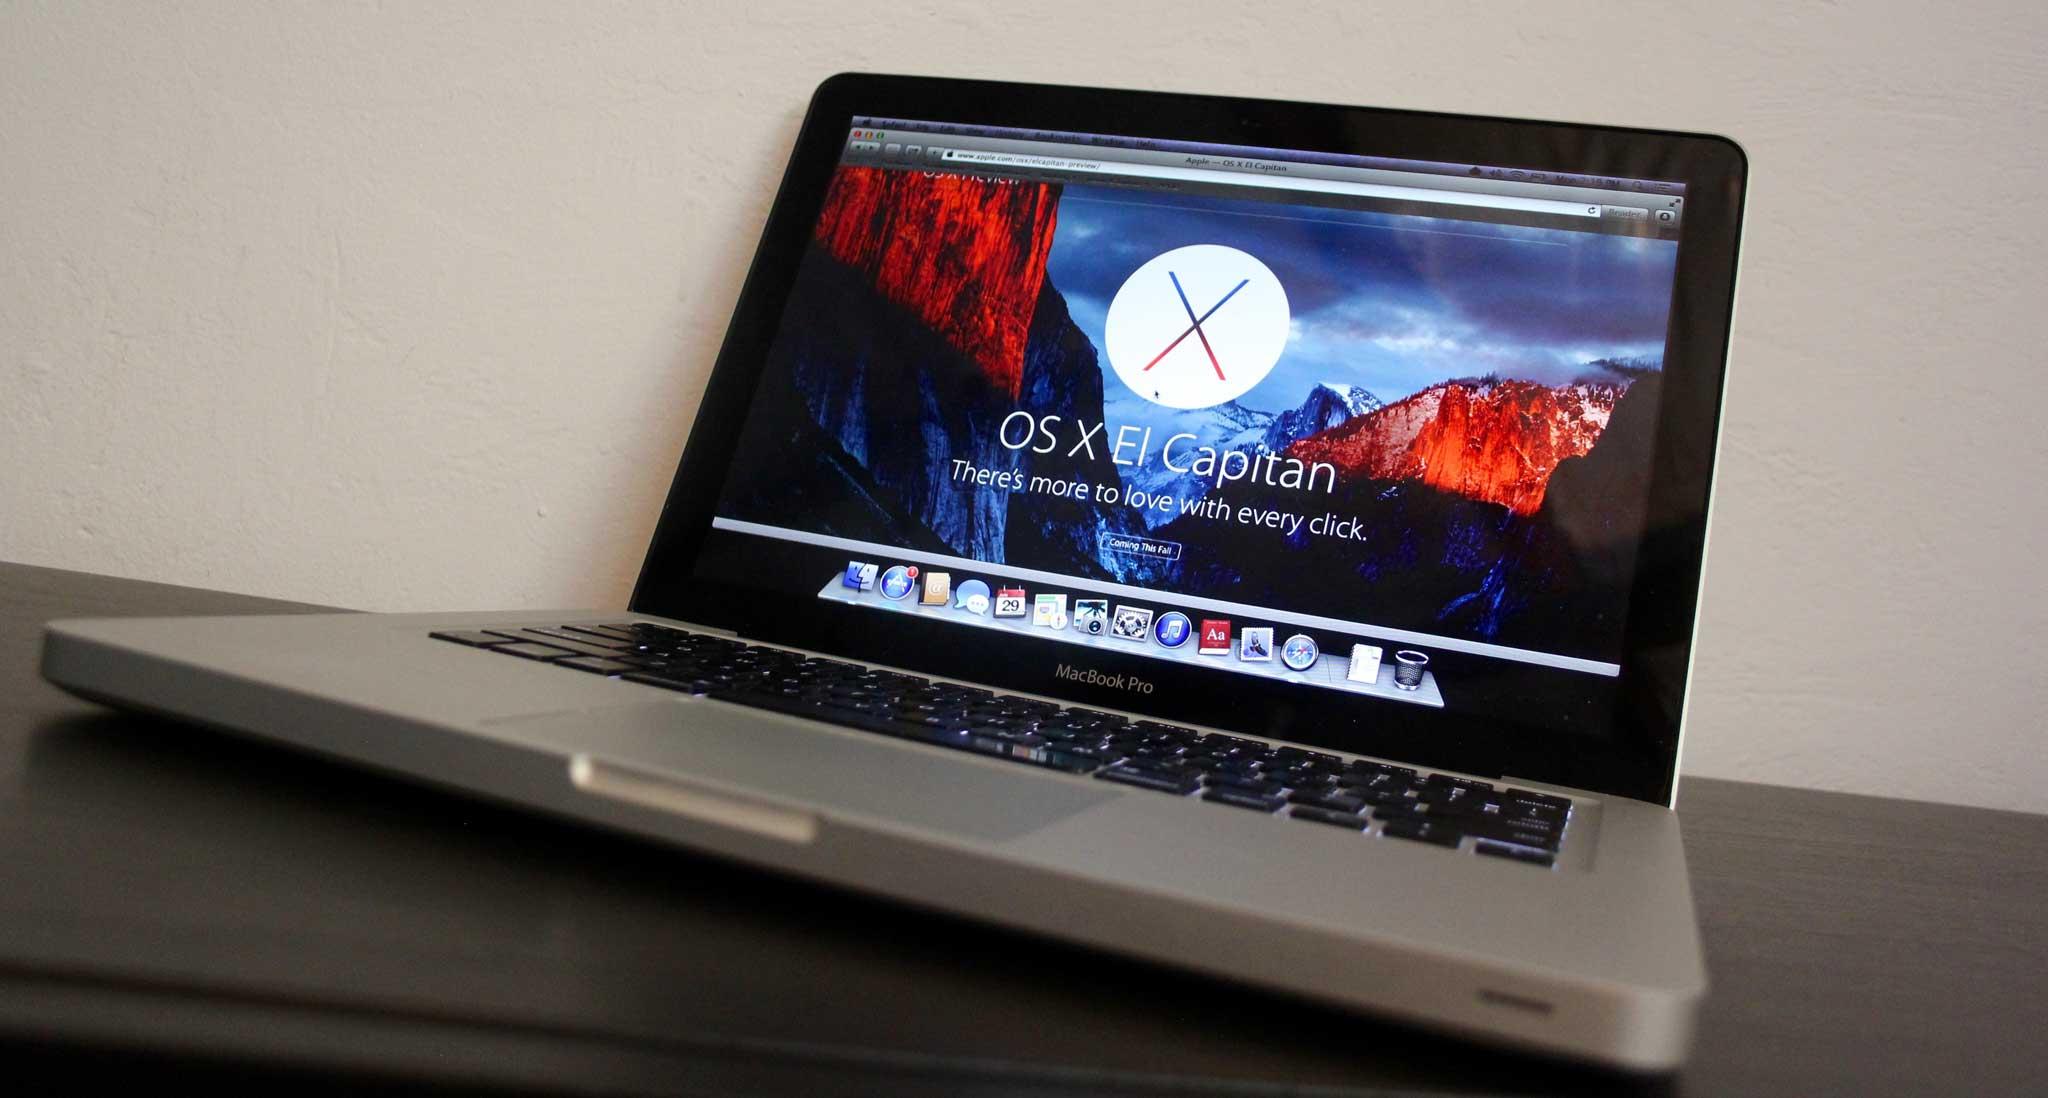 Seven years on, a MacBook Pro prepares for El Capitan – Six Colors